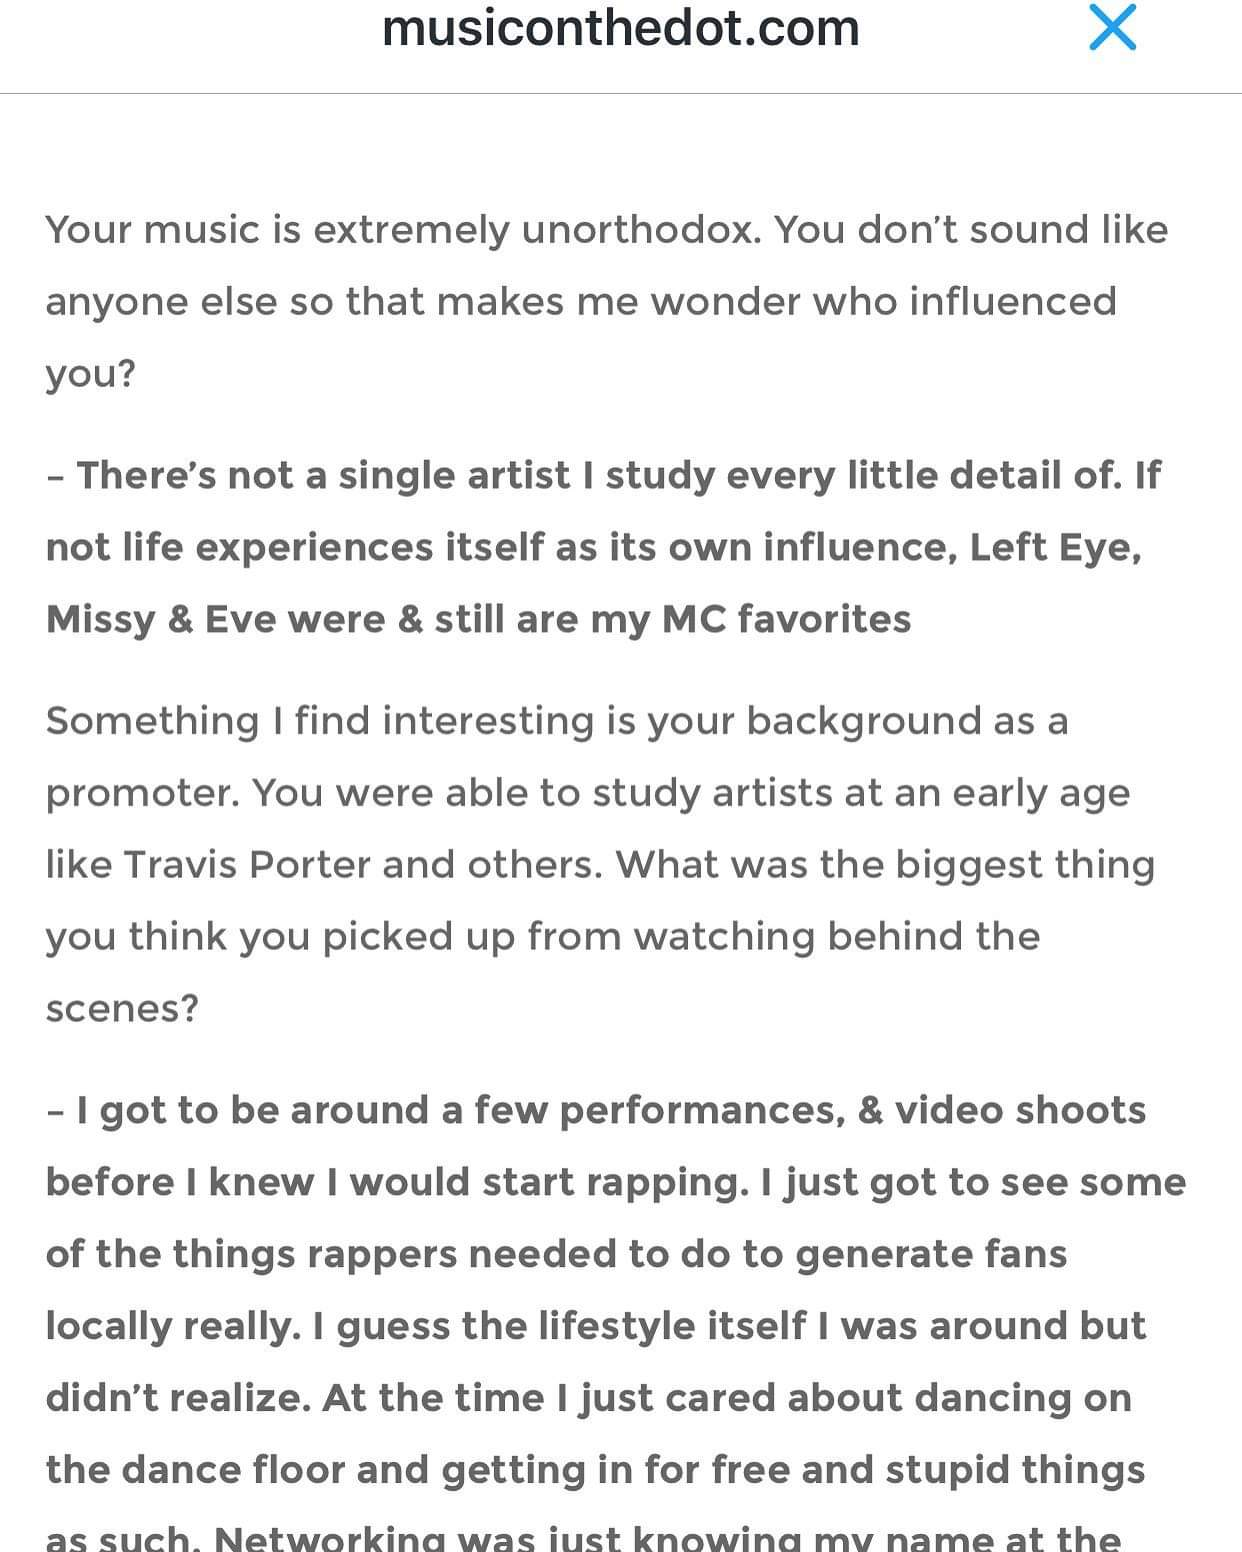 Musiconthedot.com